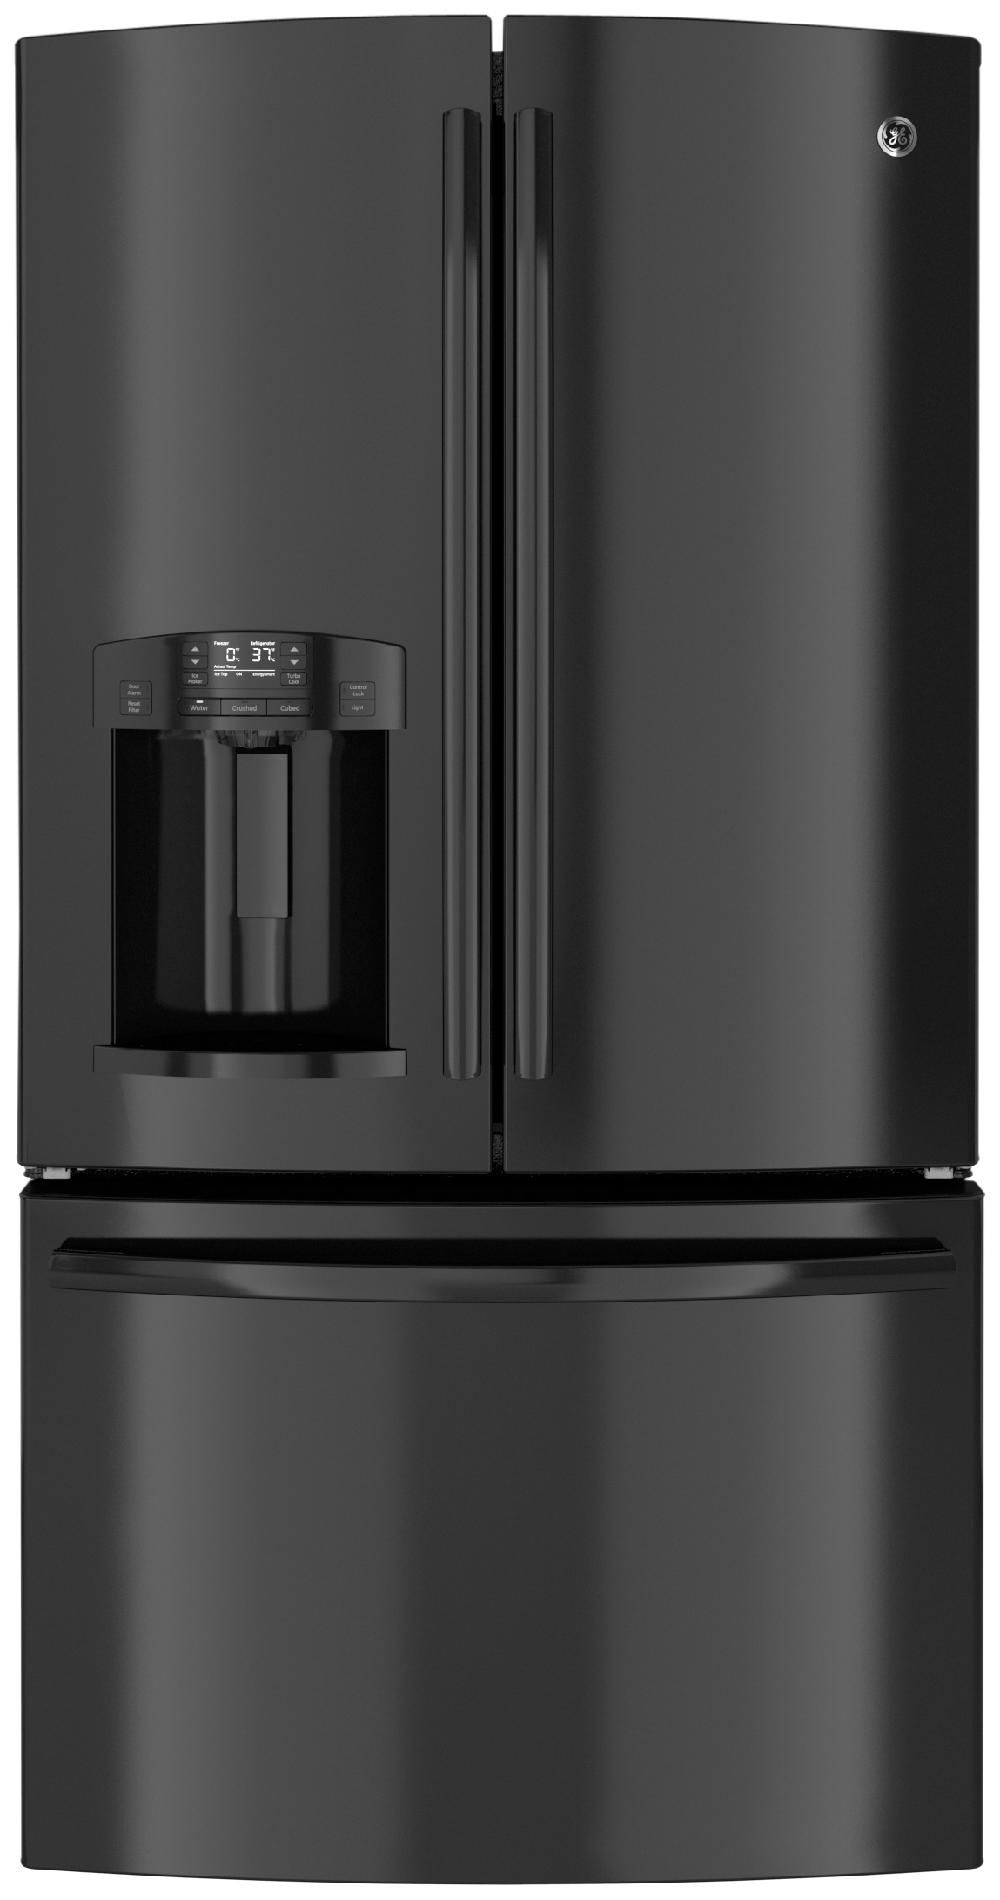 Whirlpool Wrf736sdam 25 Cu Ft French Door Refrigerator W